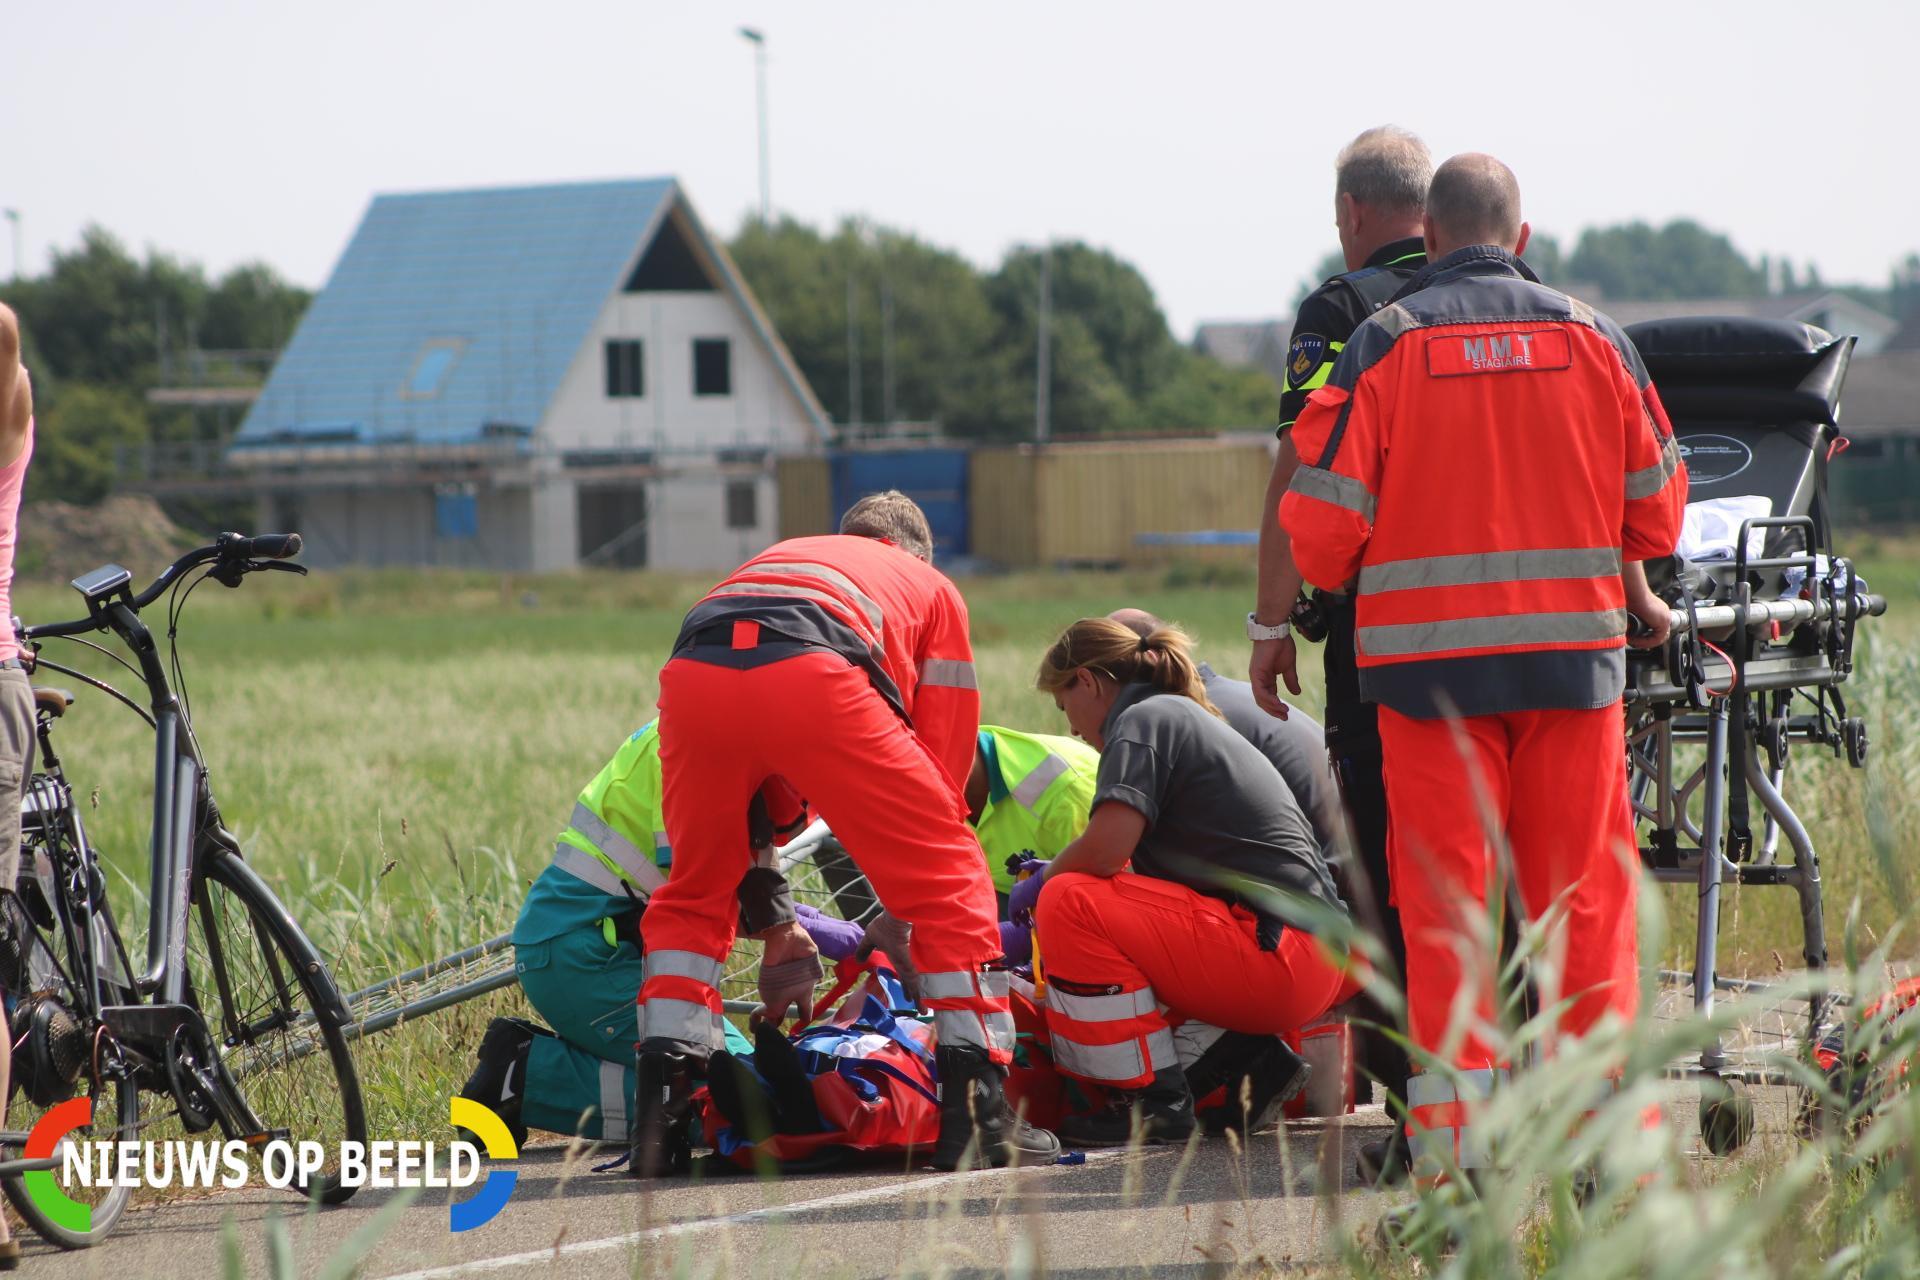 Wielrenner gewond na aanrijding met hekwerk Ramshilseweg Zuidland